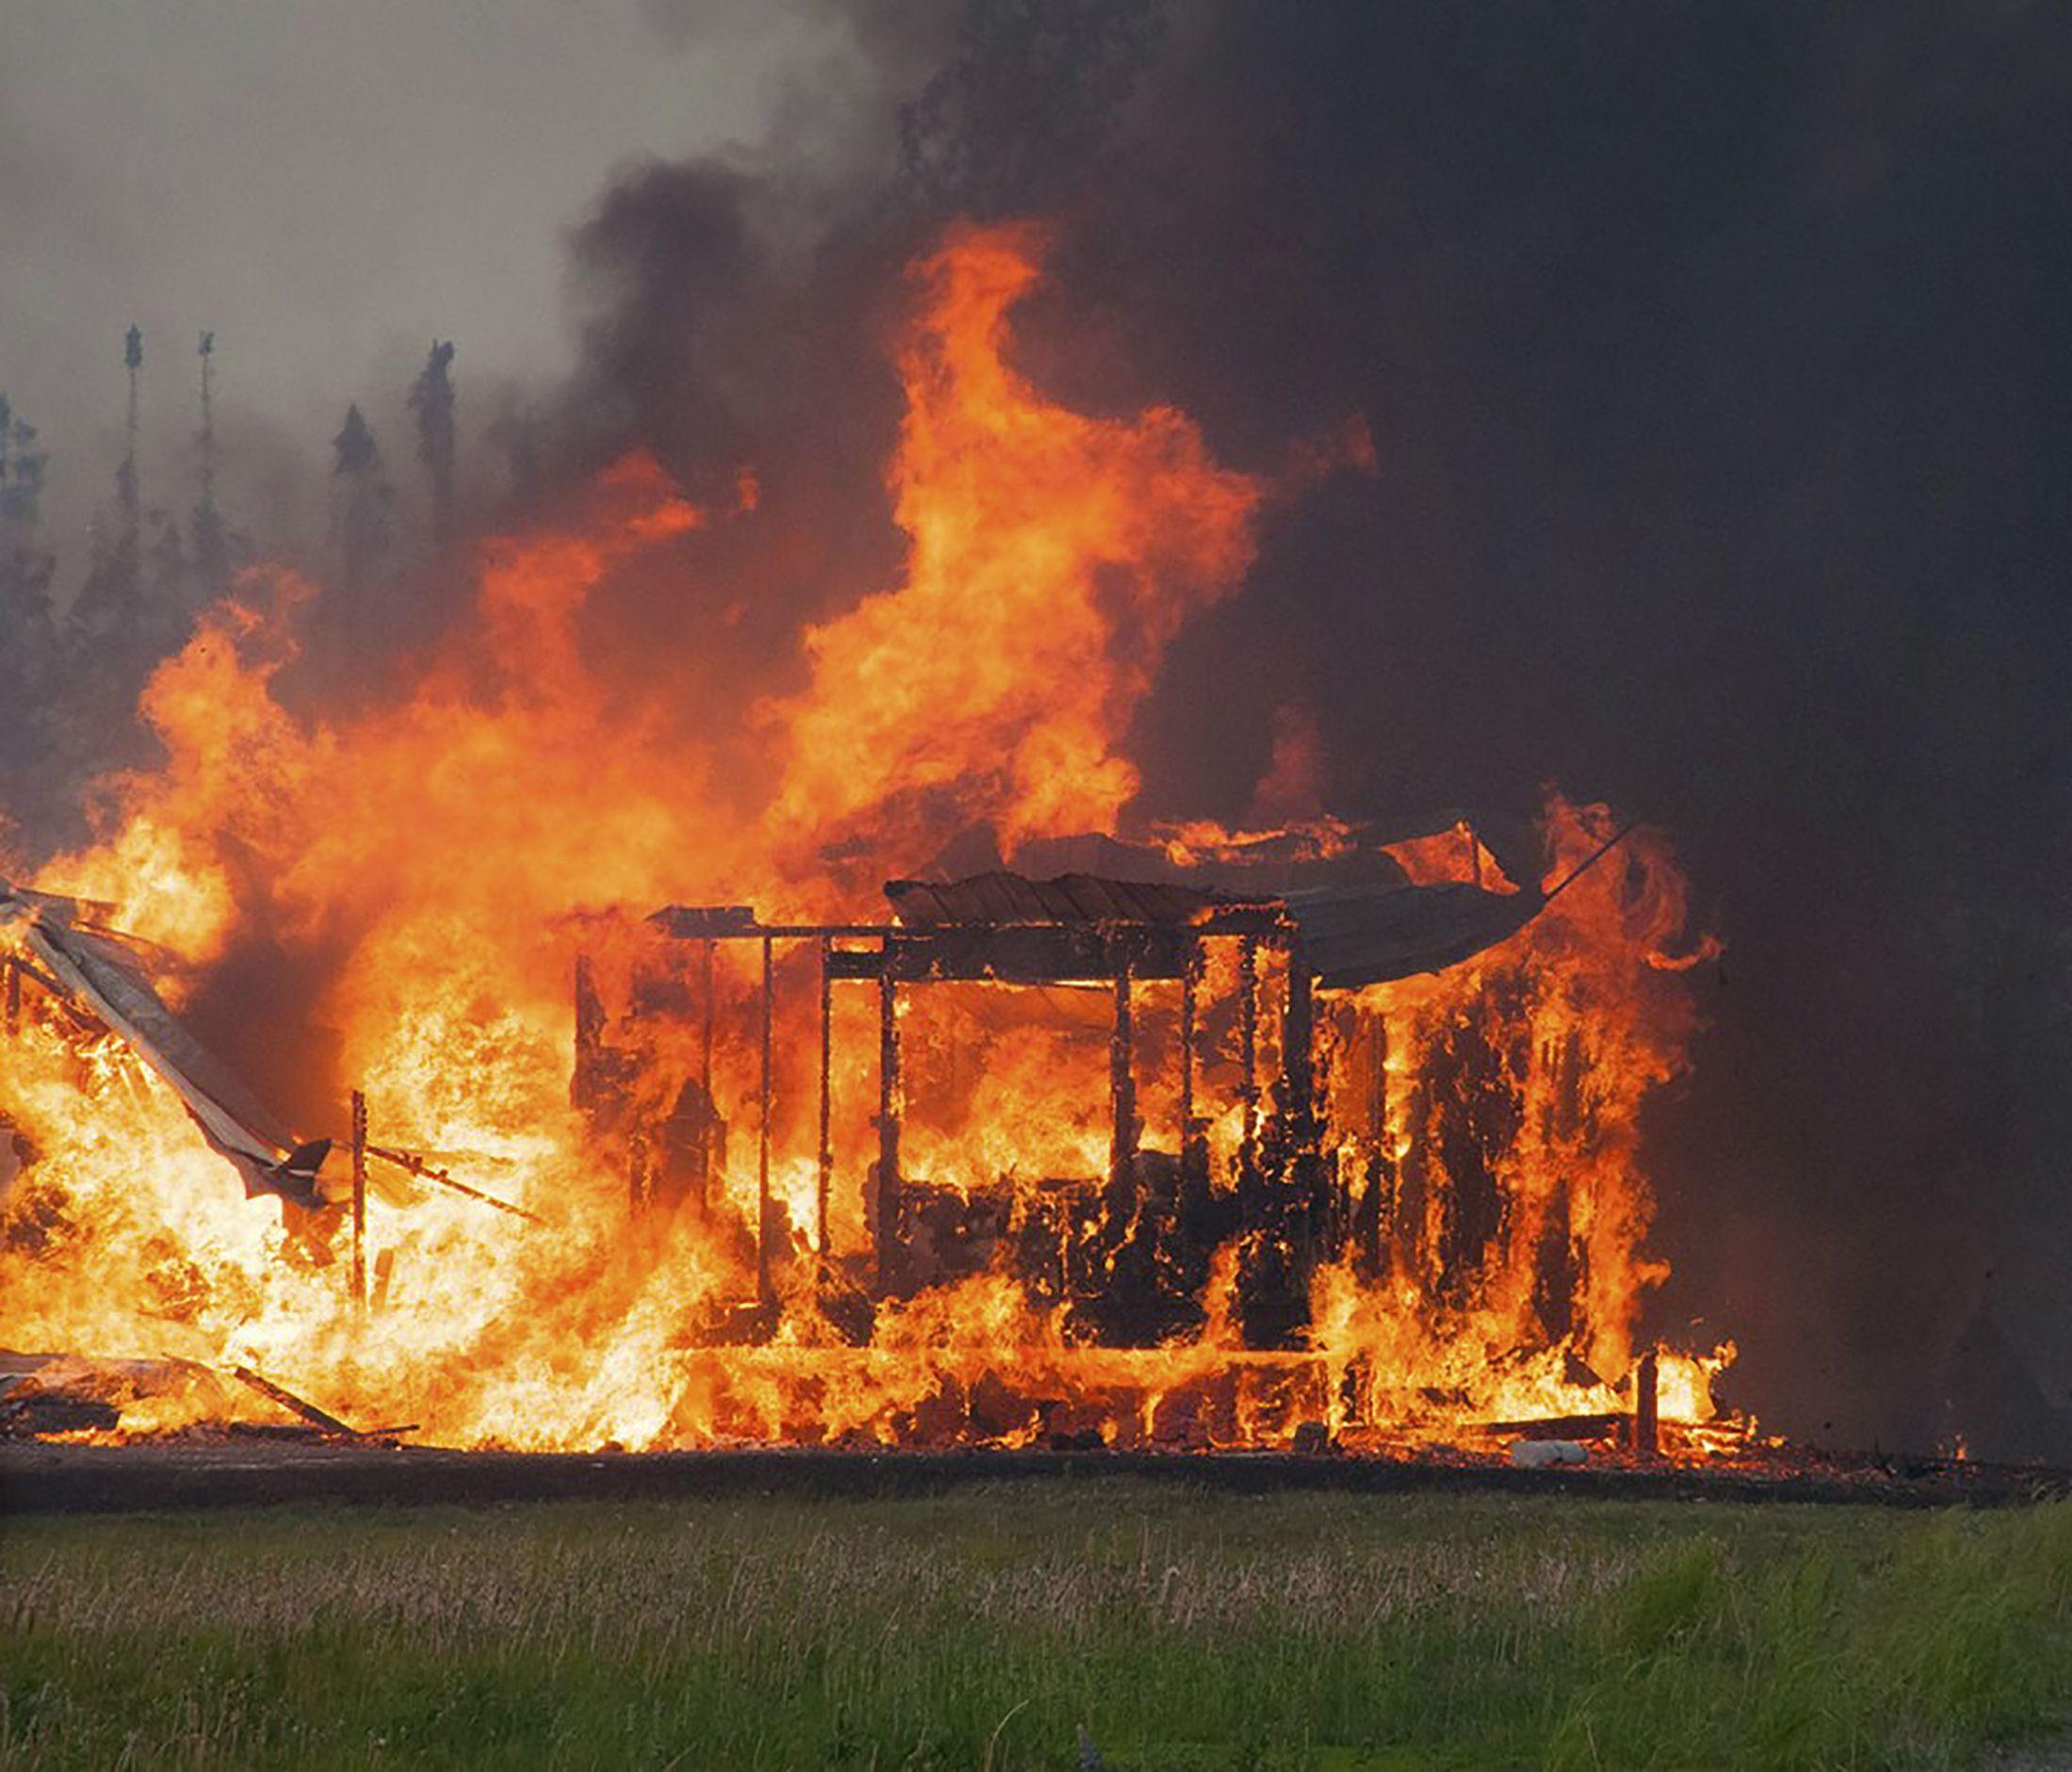 alaska crews battle second wildfire since sunday